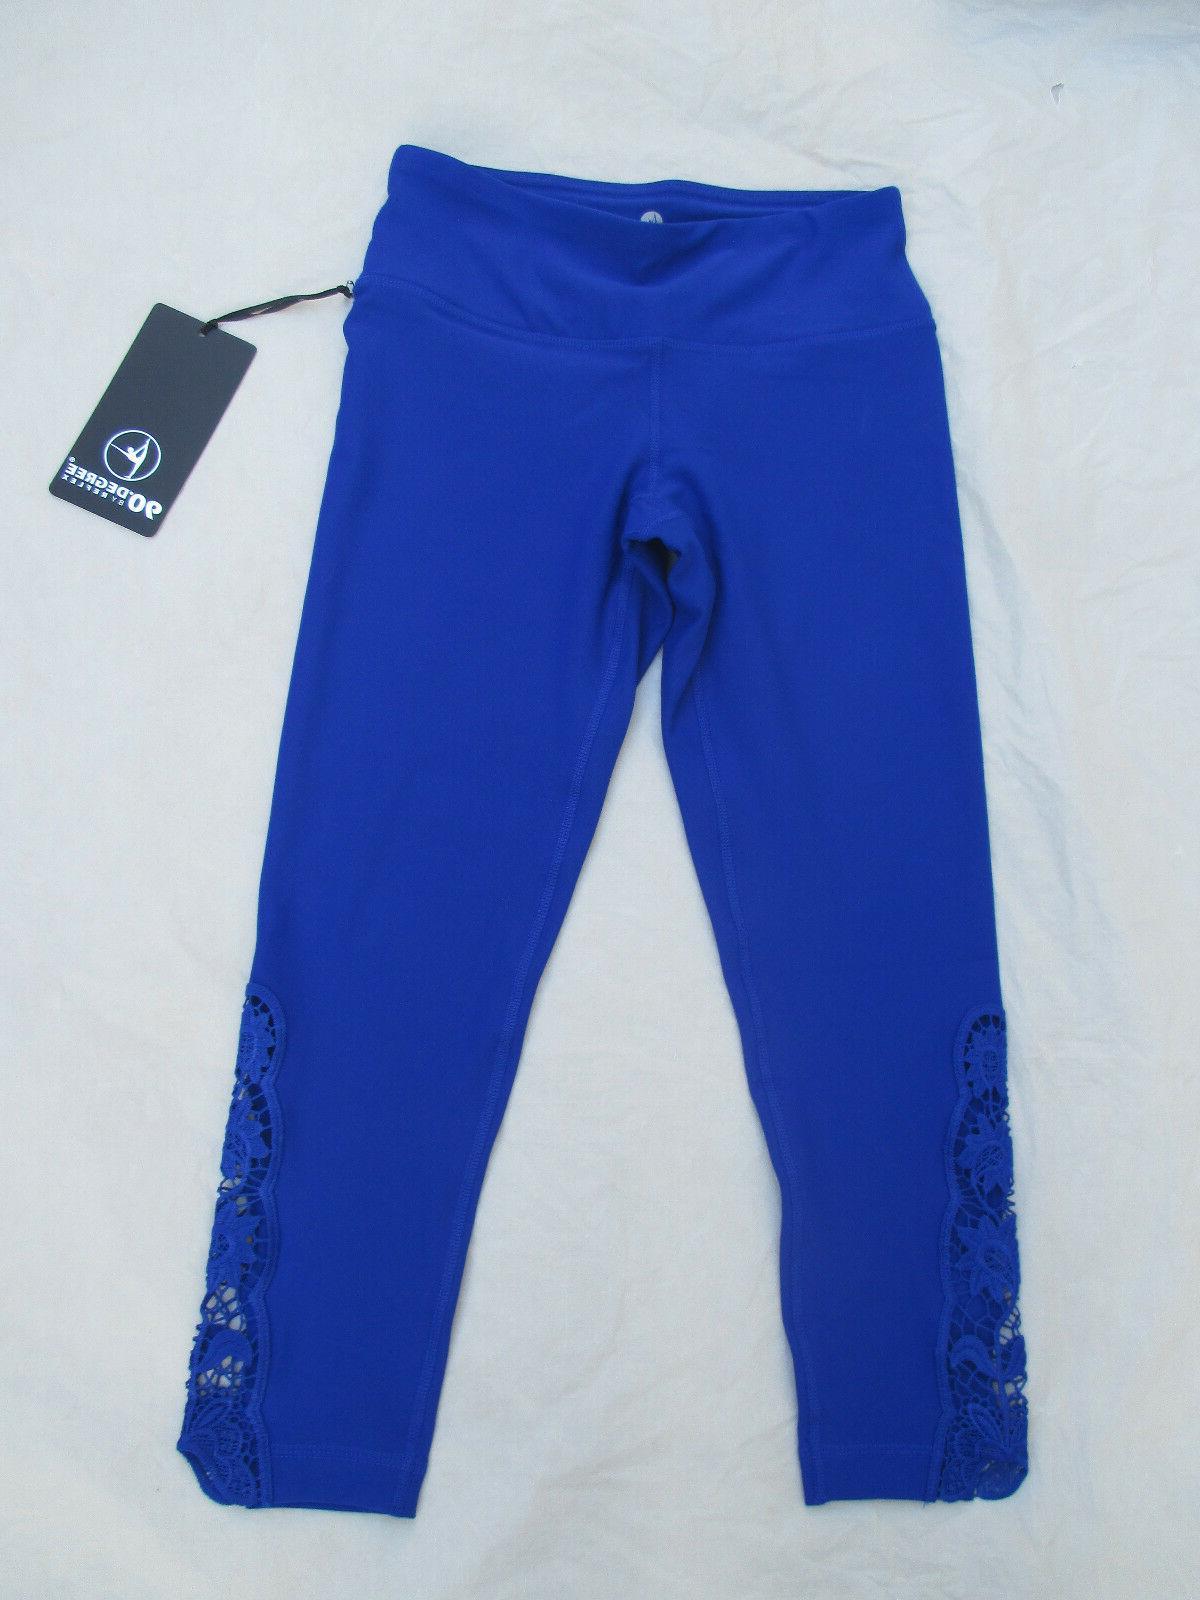 Legging Capri Degree Reflex CW68040